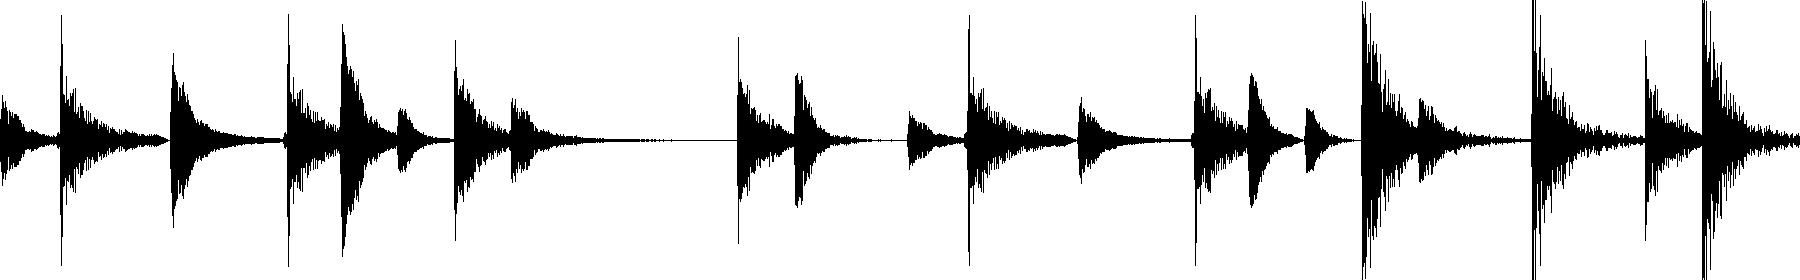 bluezone bc0210 percussion loop 011 110